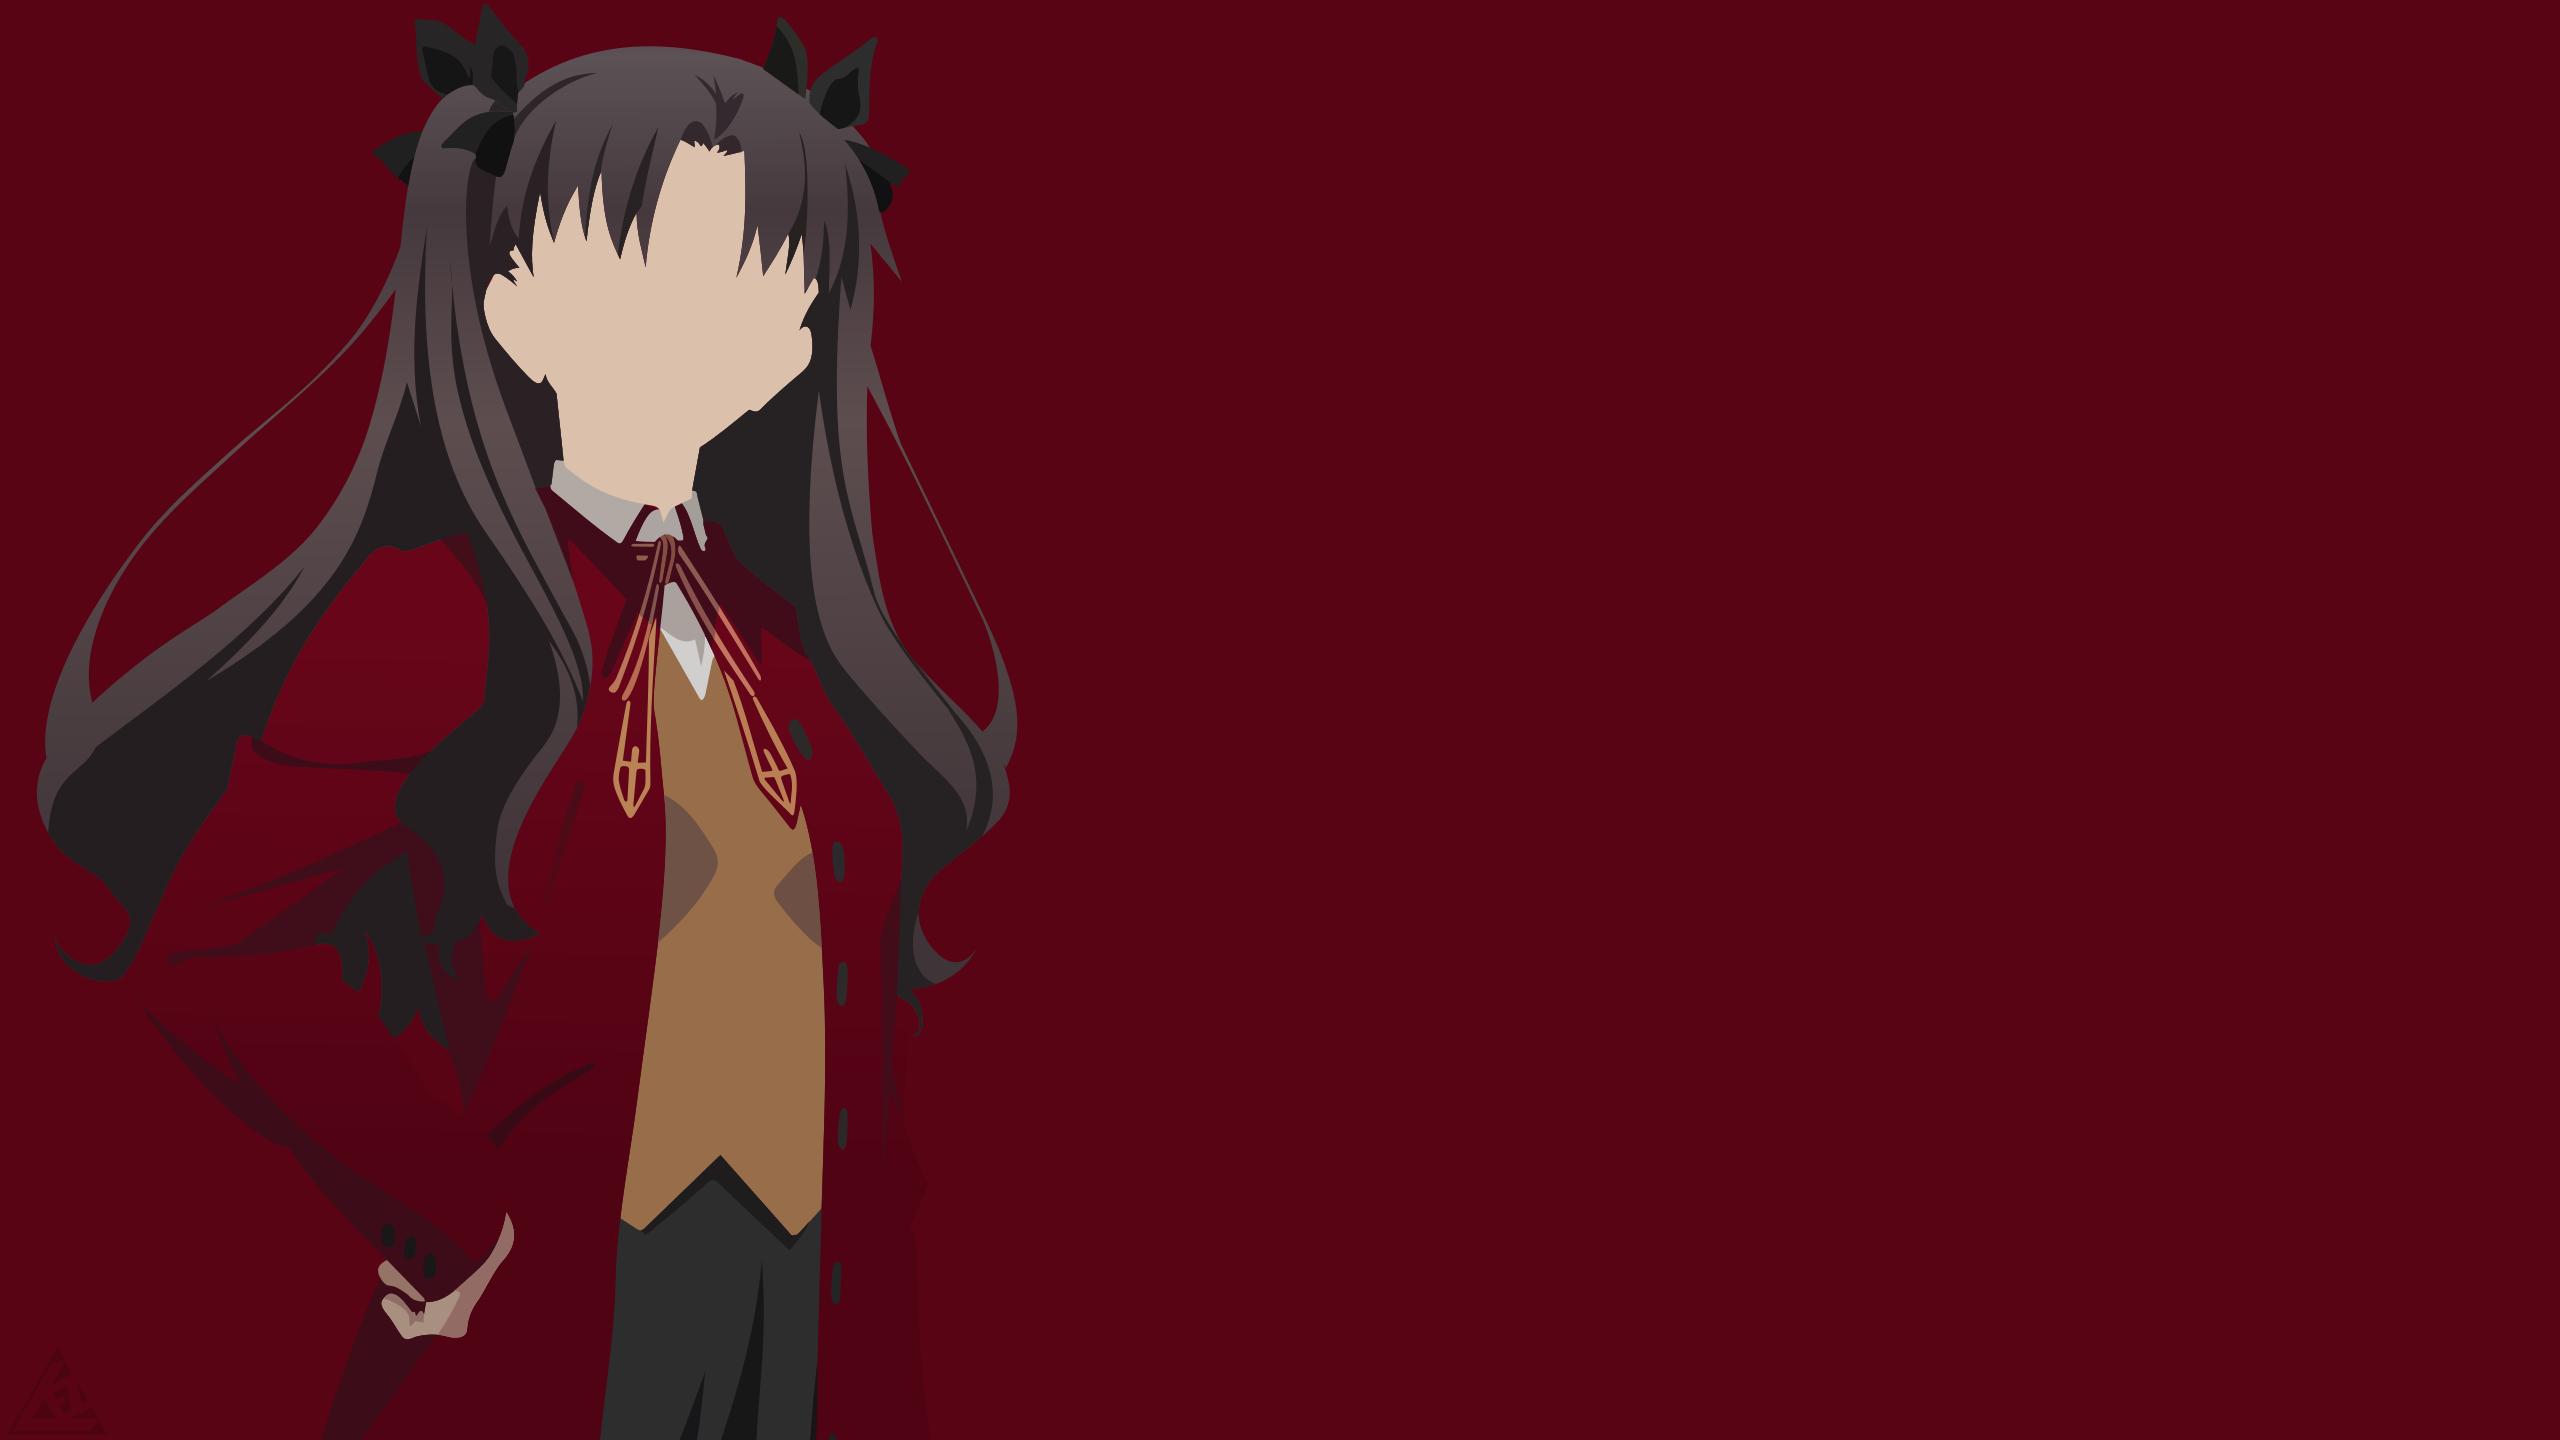 Rin Tohsaka Minimalist Fate Stay Night Rin Fate Anime Series